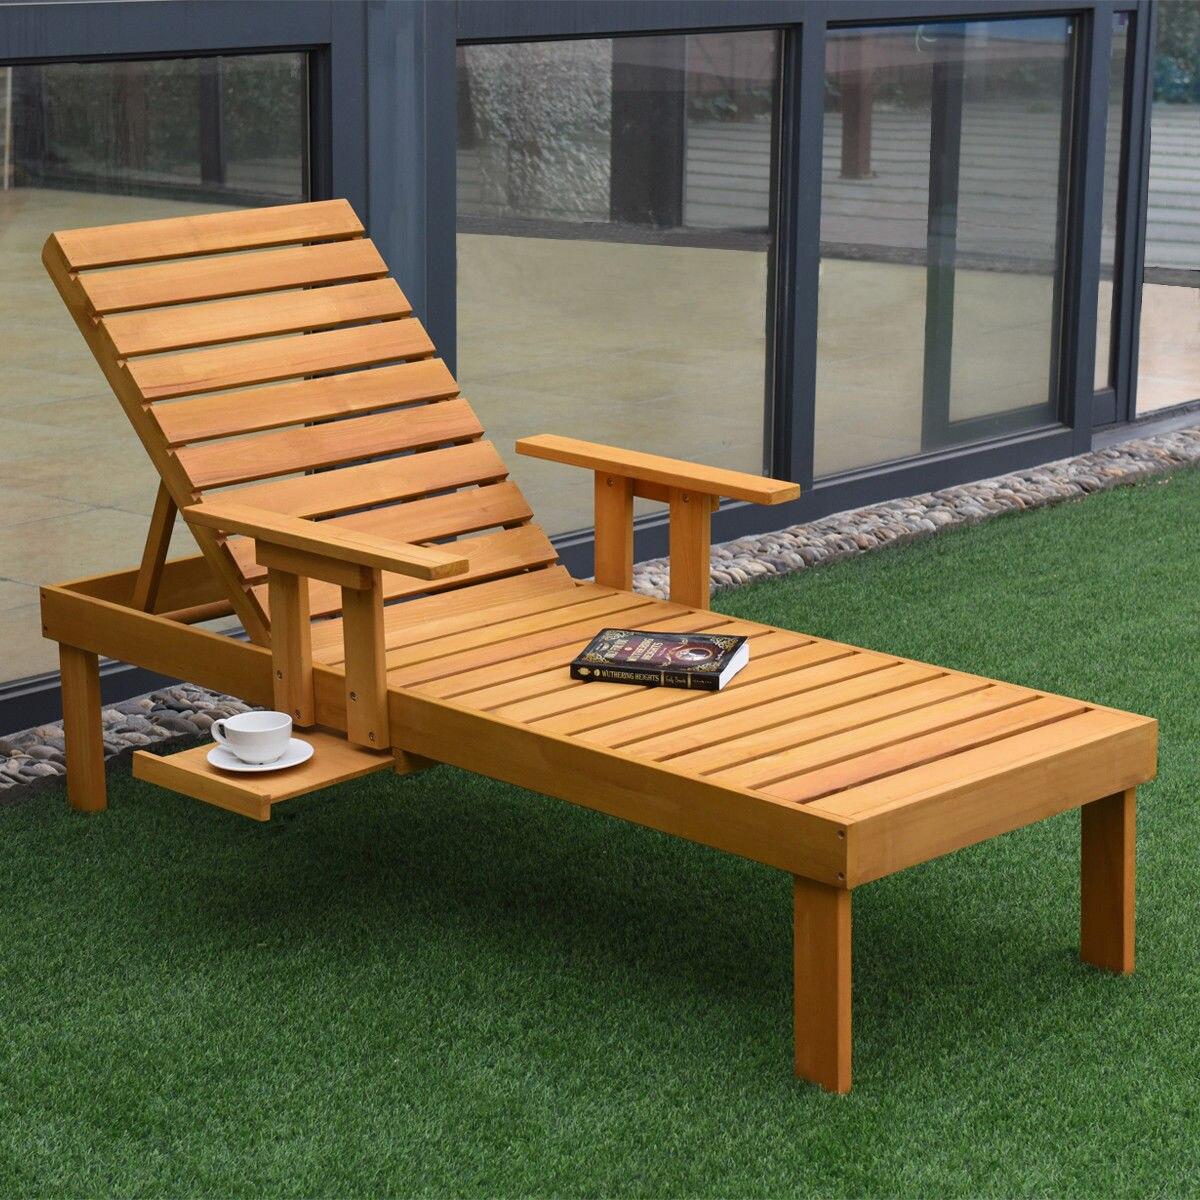 Houten Stoel Tuin.Giantex Patio Chaise Ligstoel Tuinmeubilair Tuin Side Lade Deck